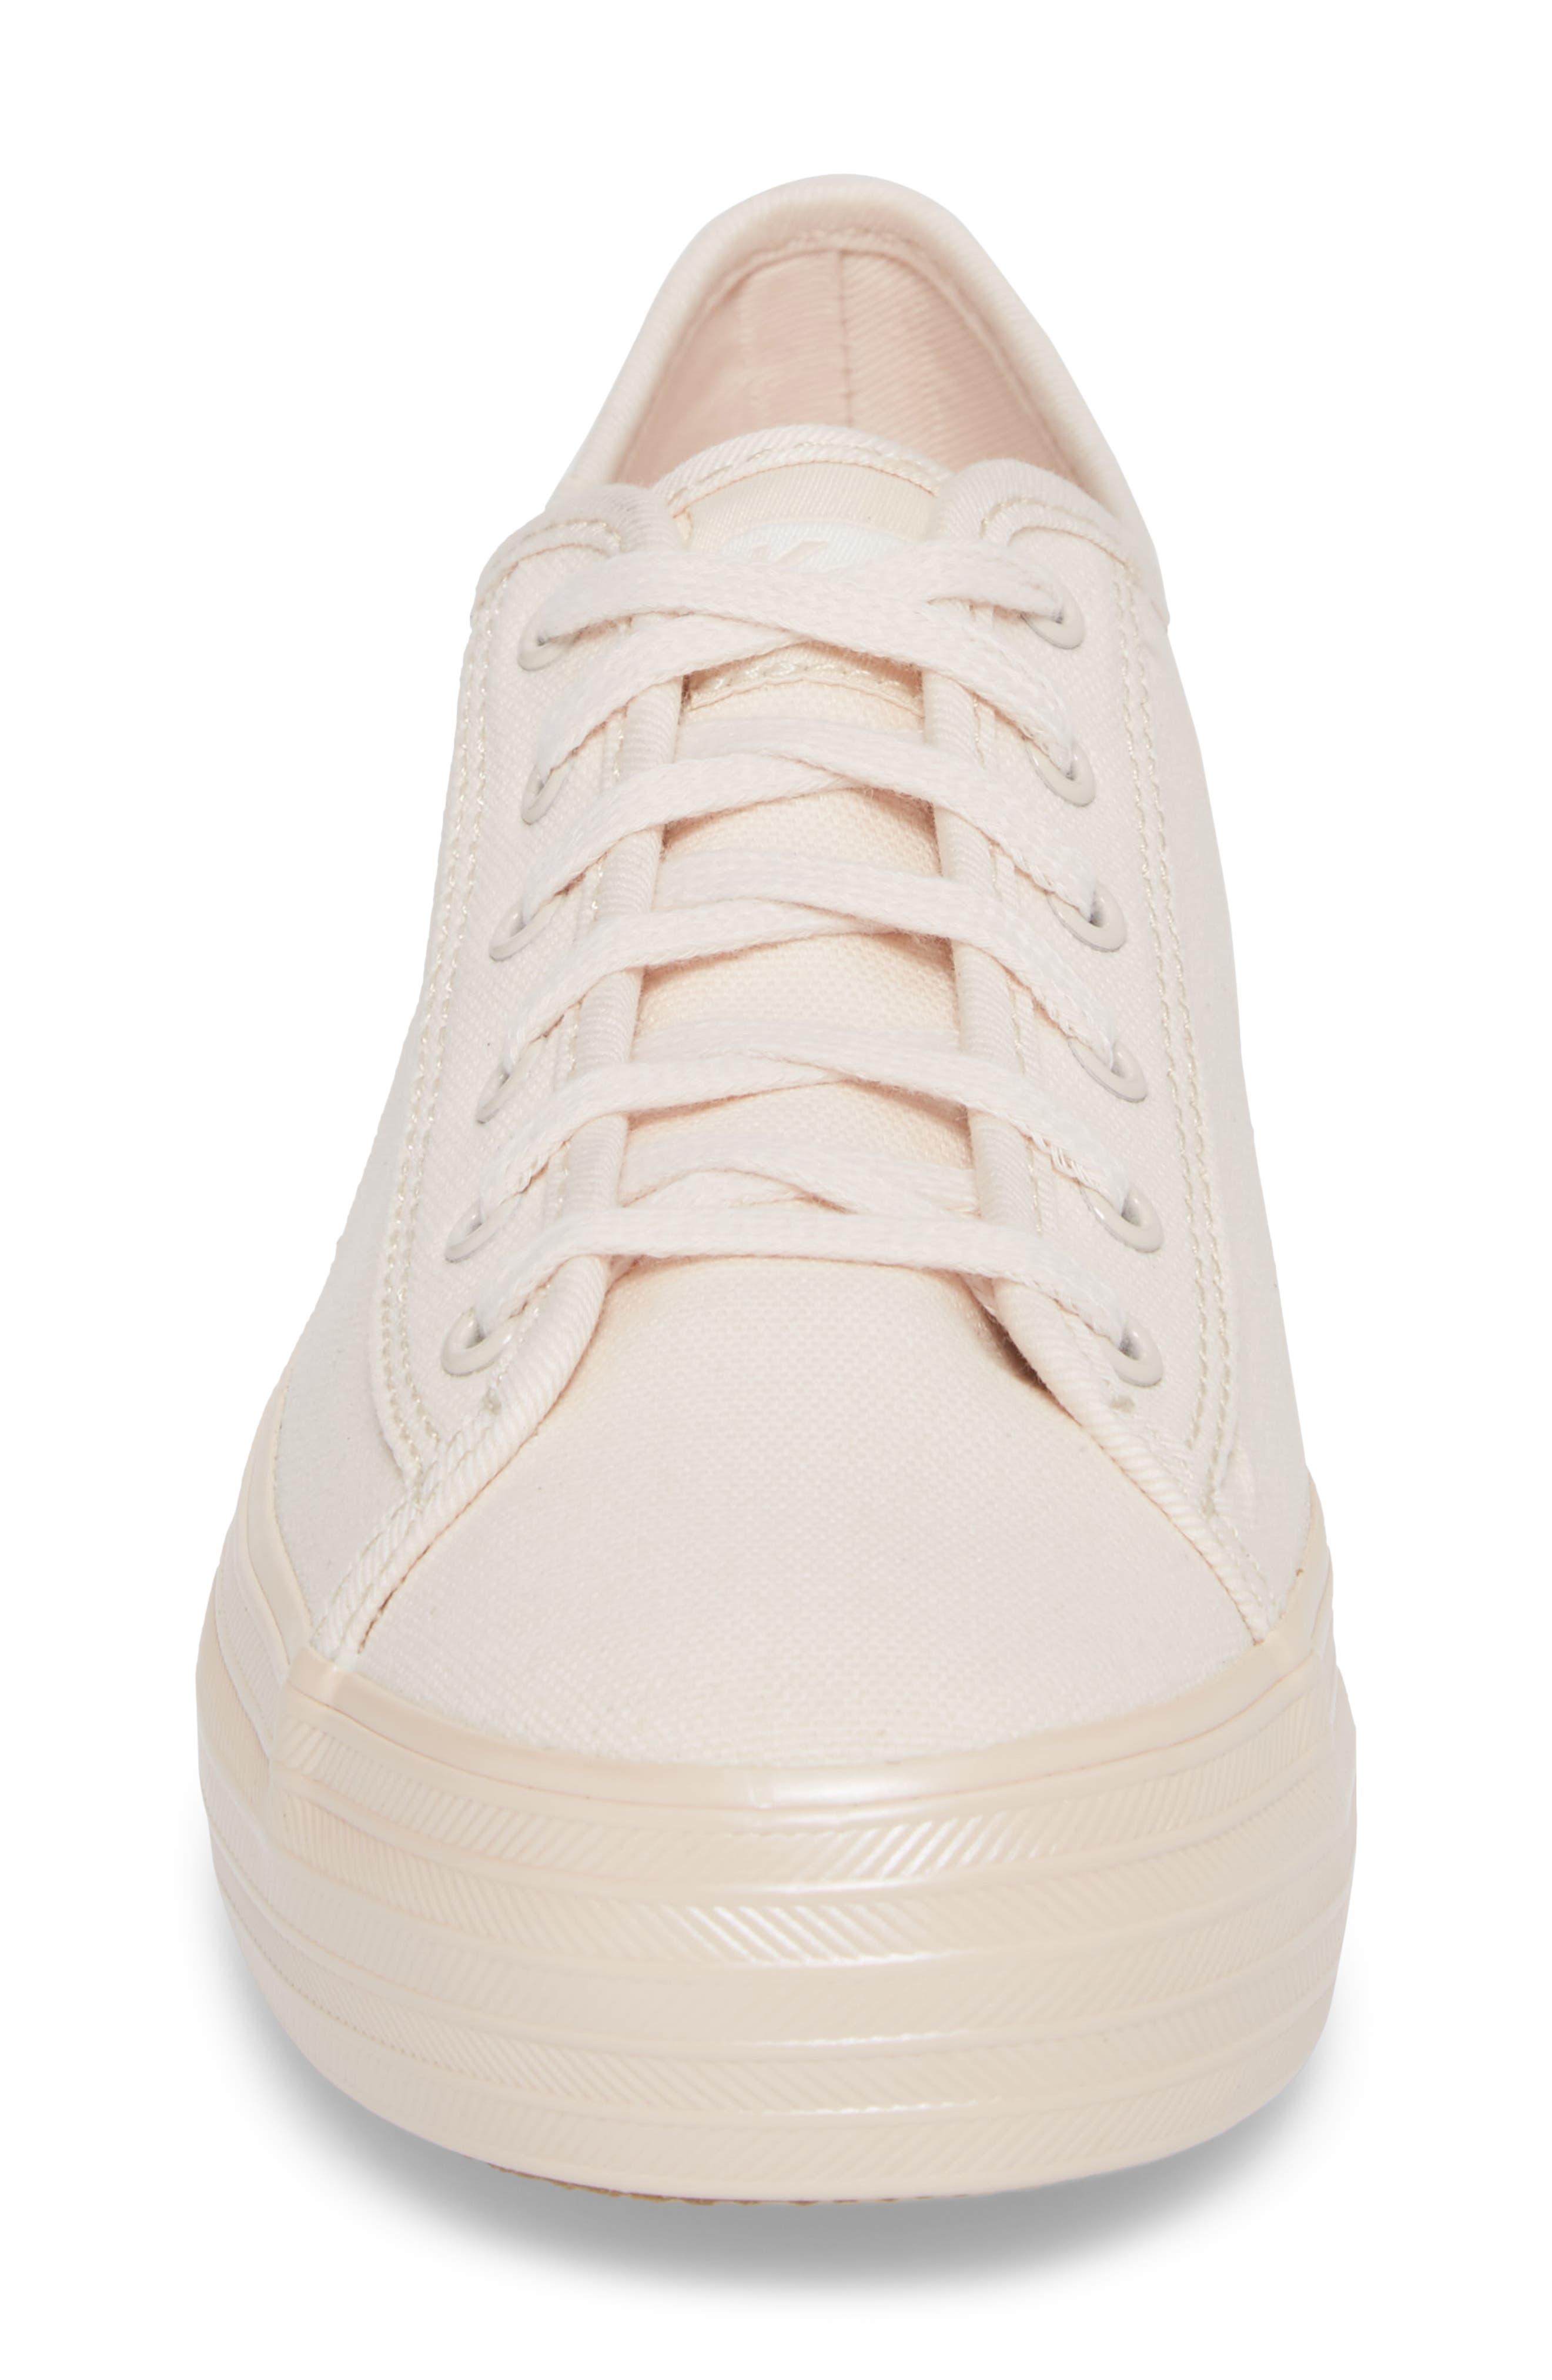 Triple Kick Lace-Up Sneaker,                             Alternate thumbnail 4, color,                             680